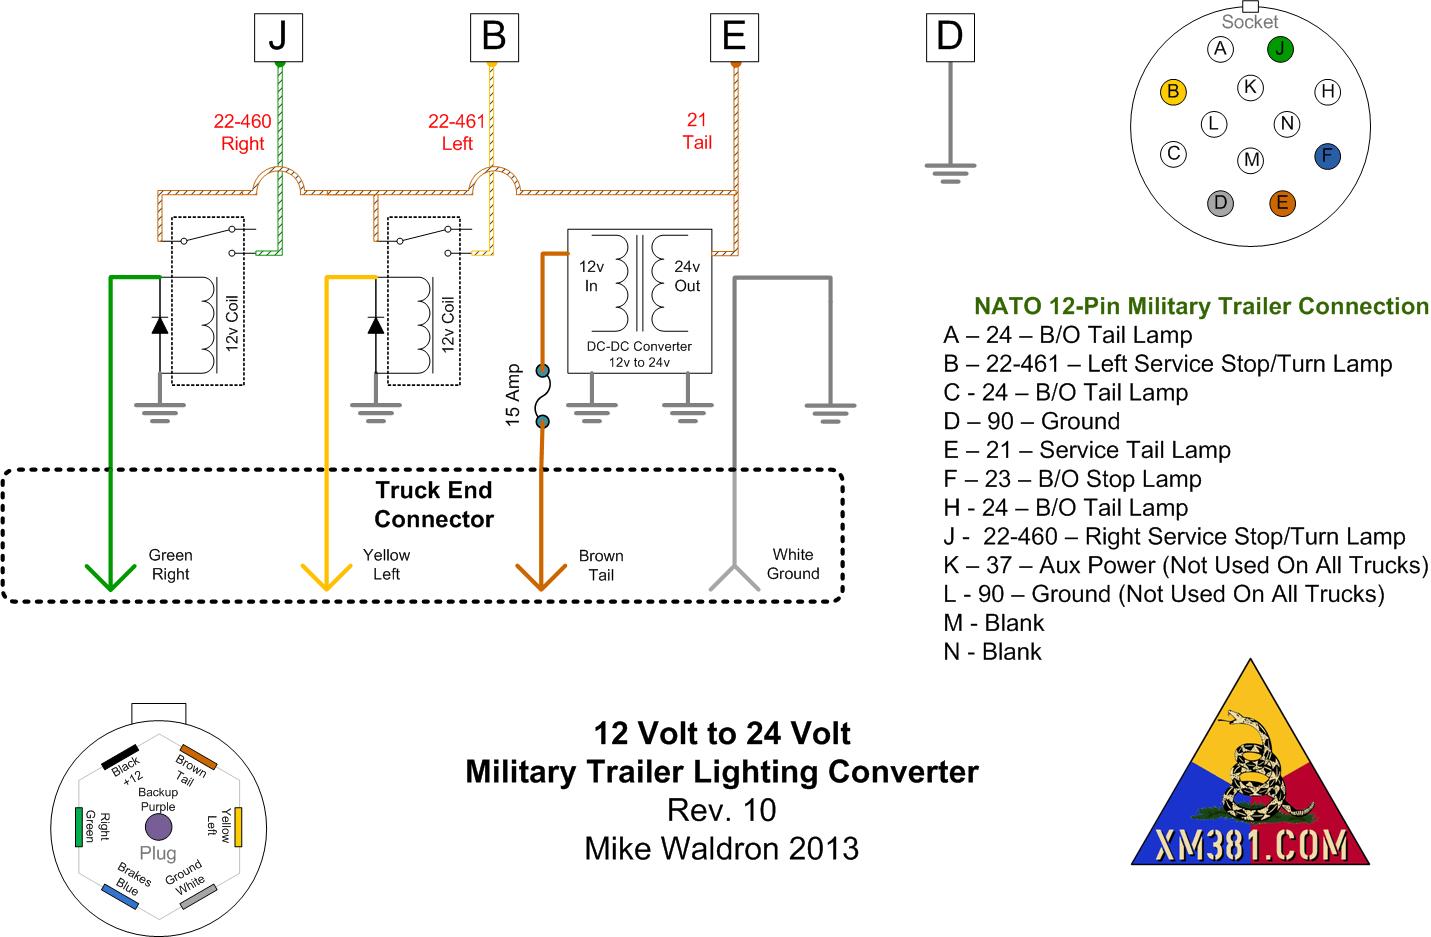 4 Way Trailer Plug Wiring Diagram Semi Truck Xm381 12 Volt Civllian Truck To 24 Volt Military Trailer